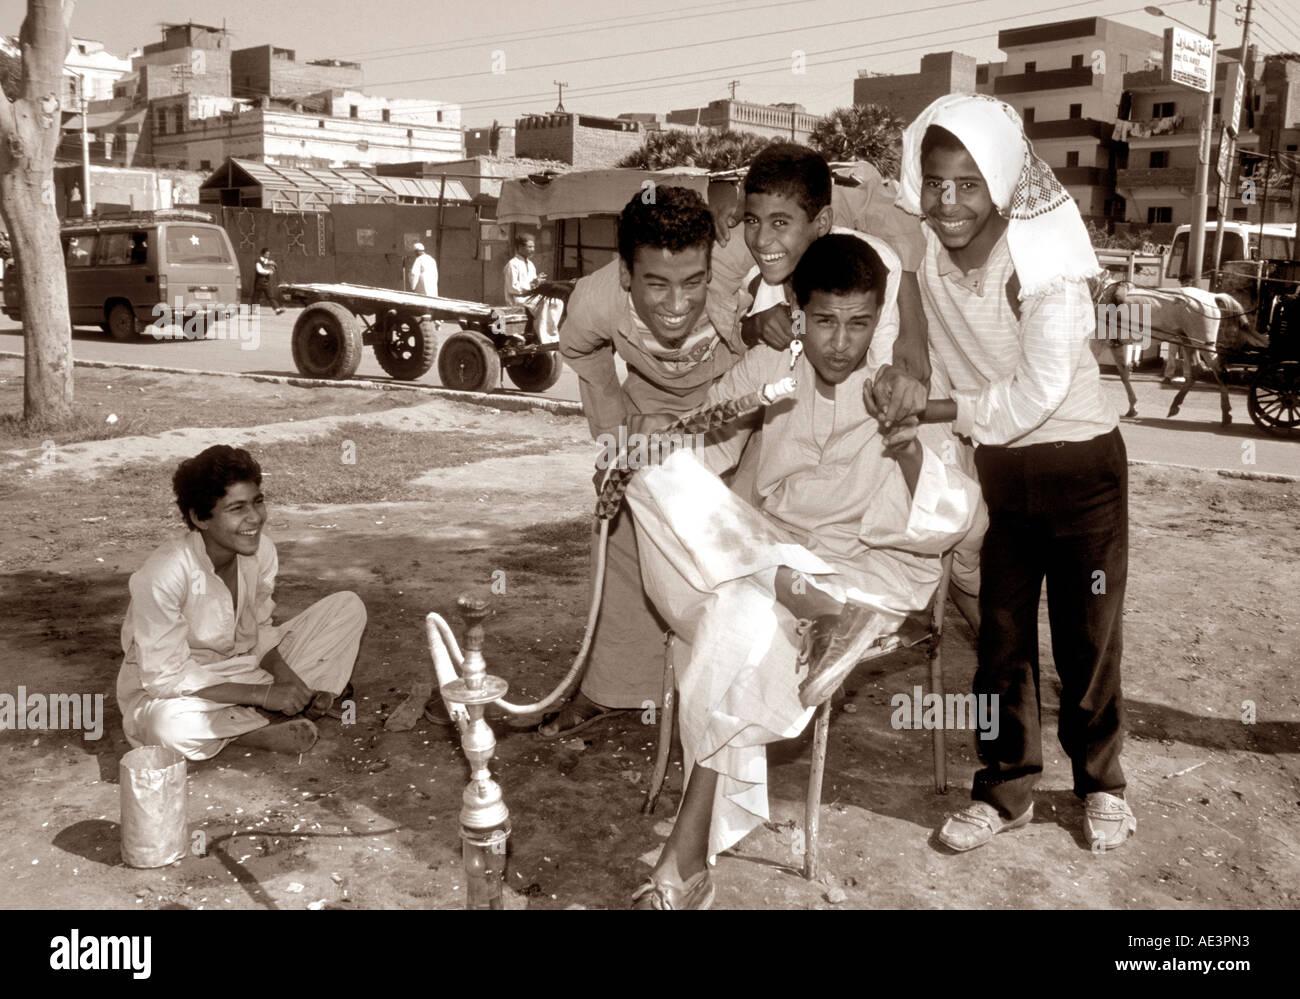 Egyptian Young Men Luxor Egypt - Stock Image